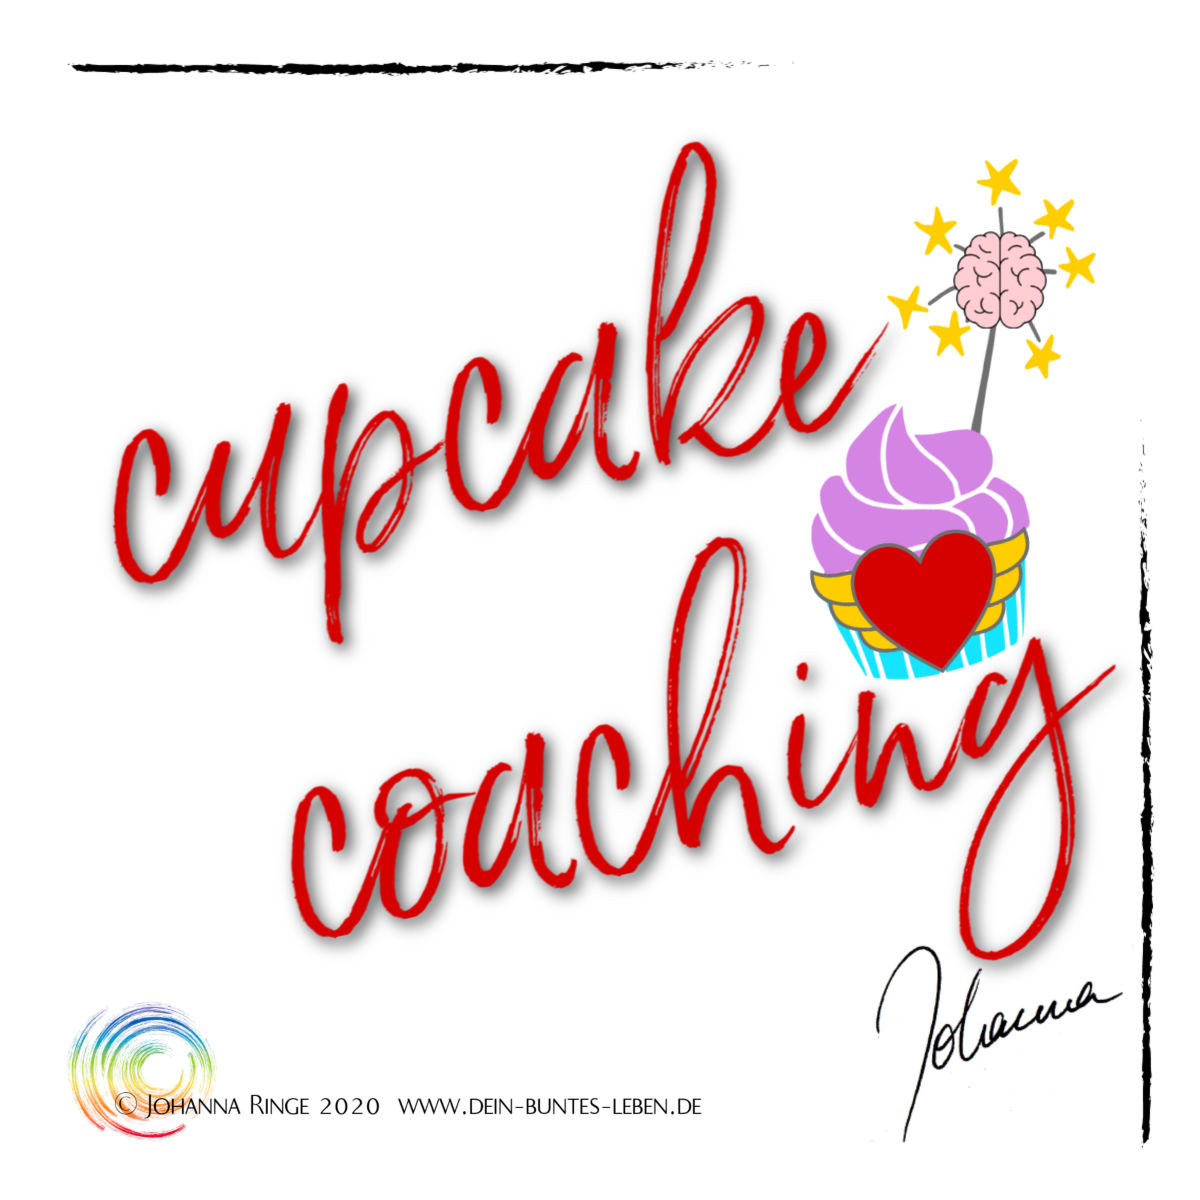 Cupcake Coaching with Johanna Ringe, a work with heart and brain! ©2020 Johanna Ringe www.dein-buntes-leben.de